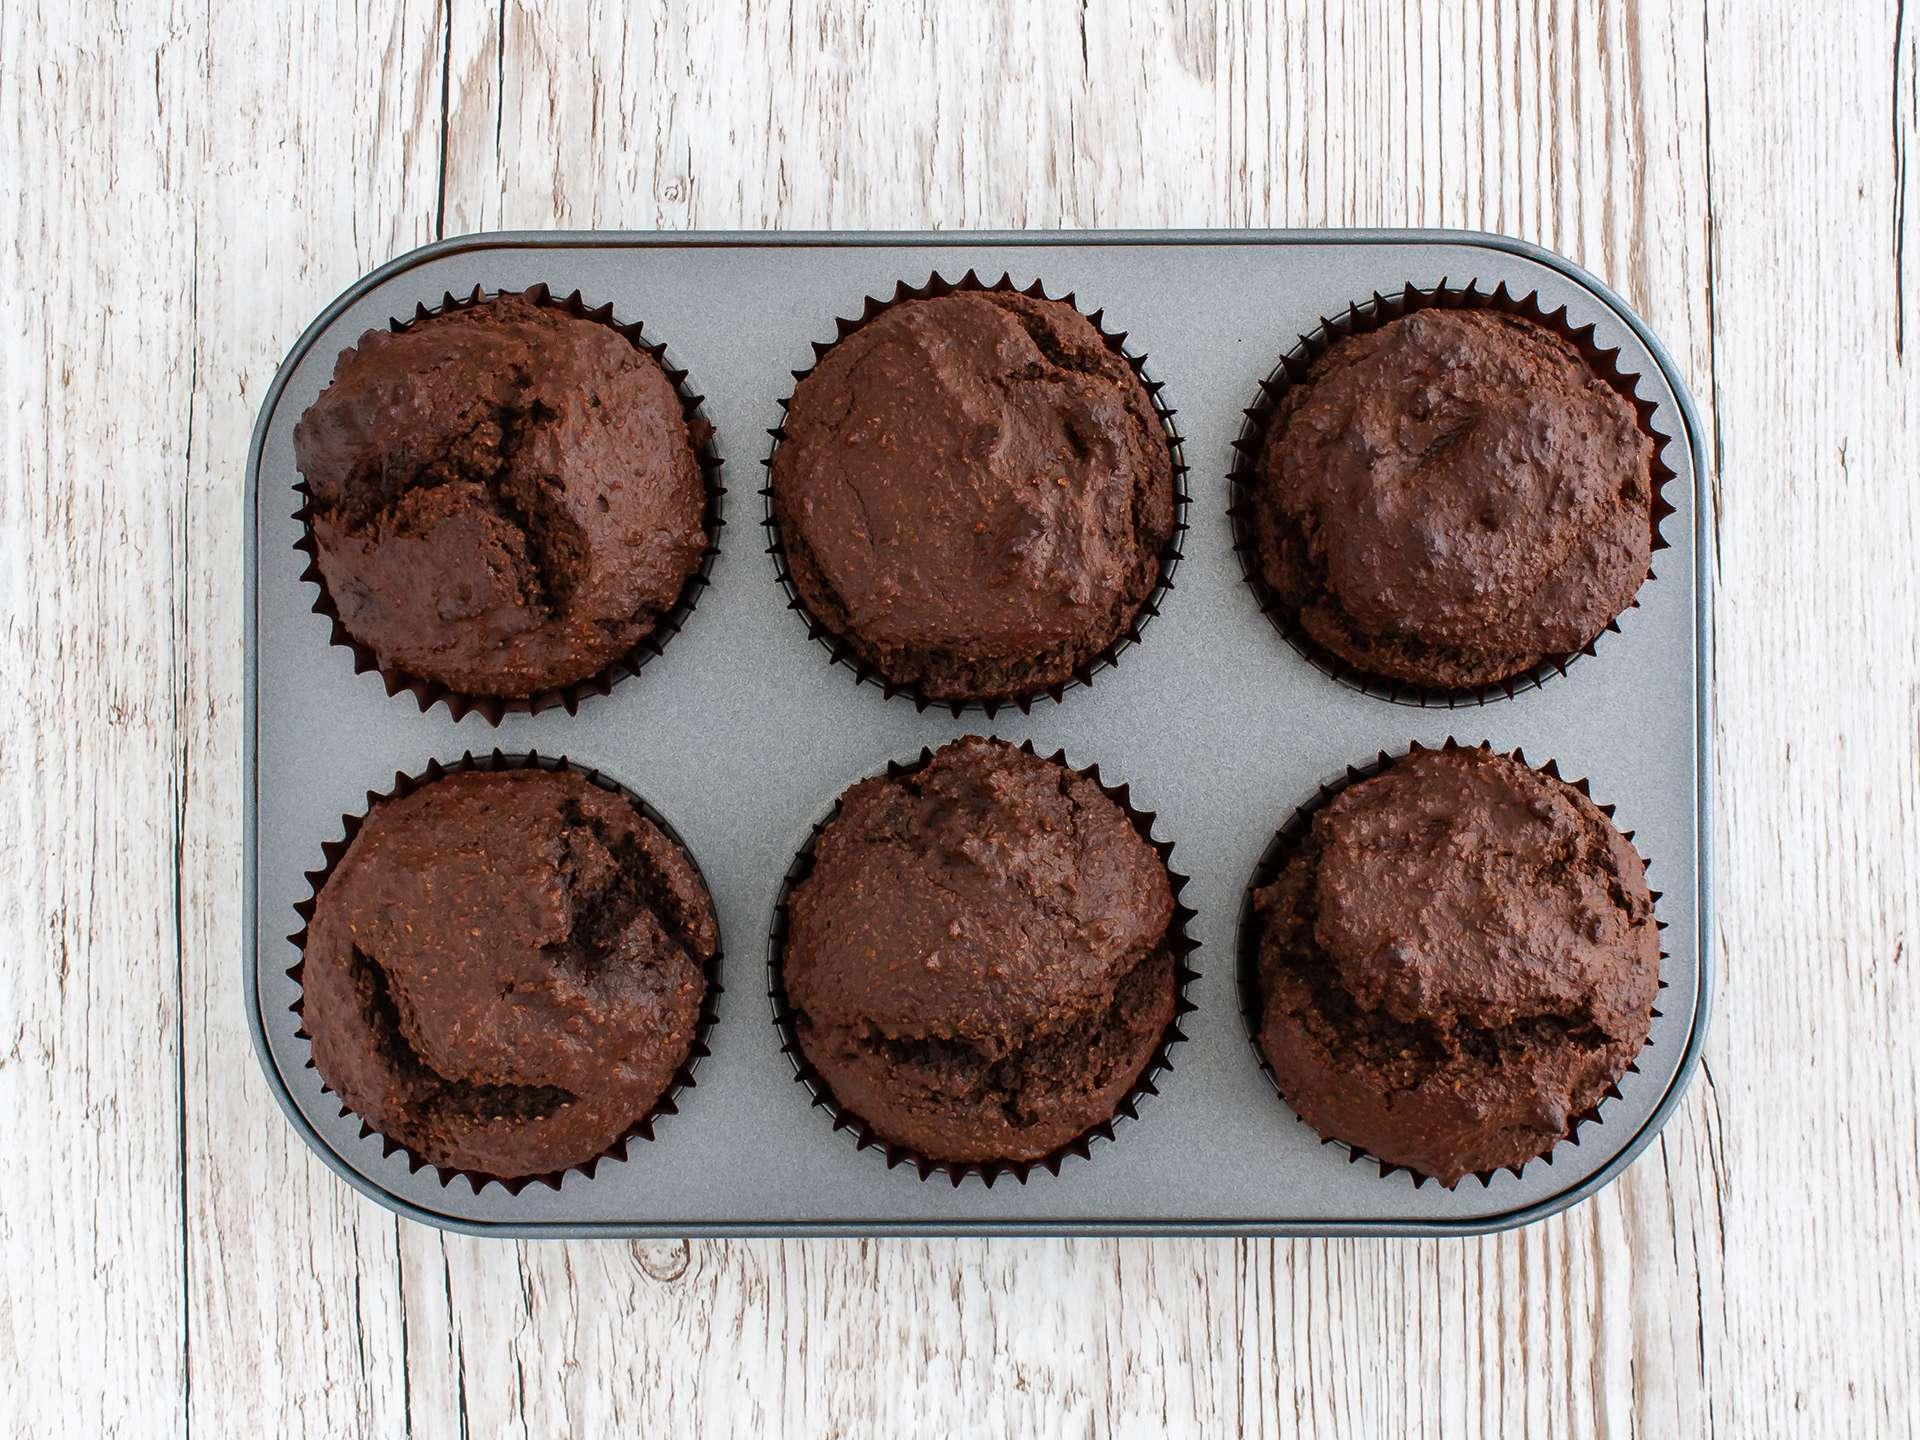 Step 3.2 of Gluten Free Vegan Chocolate Cupcakes with Apricot Jam Recipe